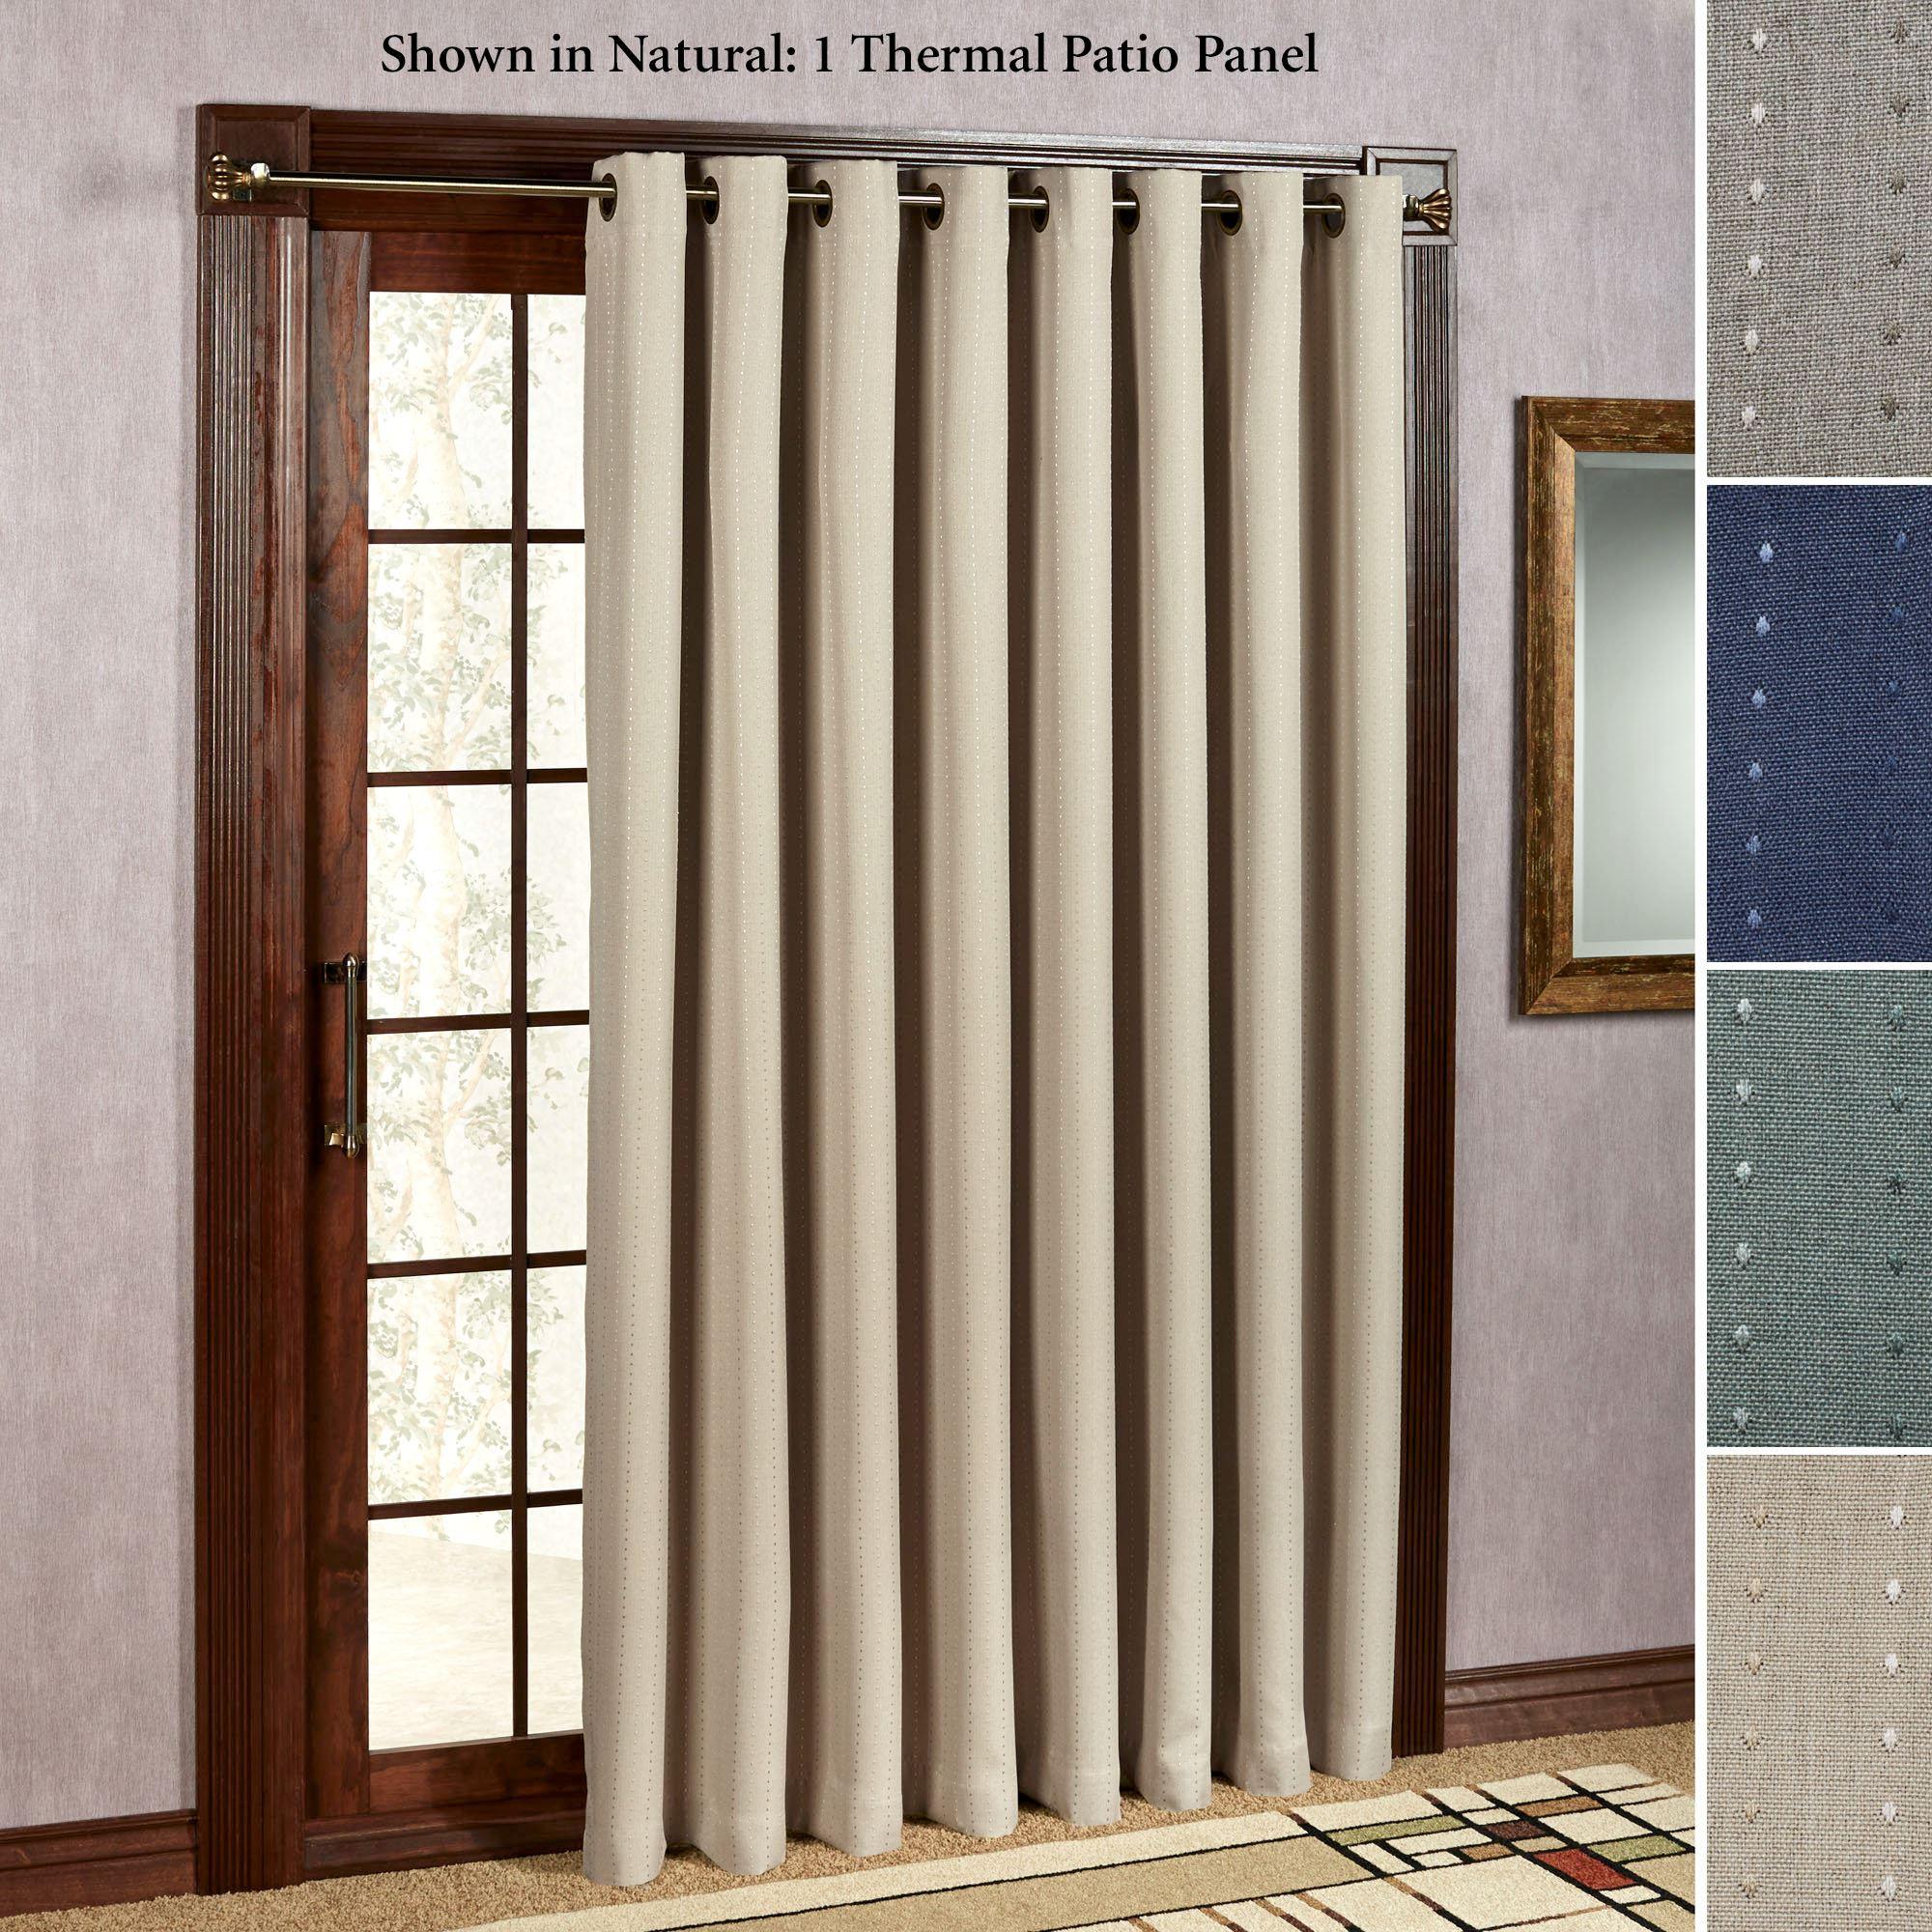 Popular Grand Pointe Grommet Patio Curtain Panel 110 x 84 sliding door curtains